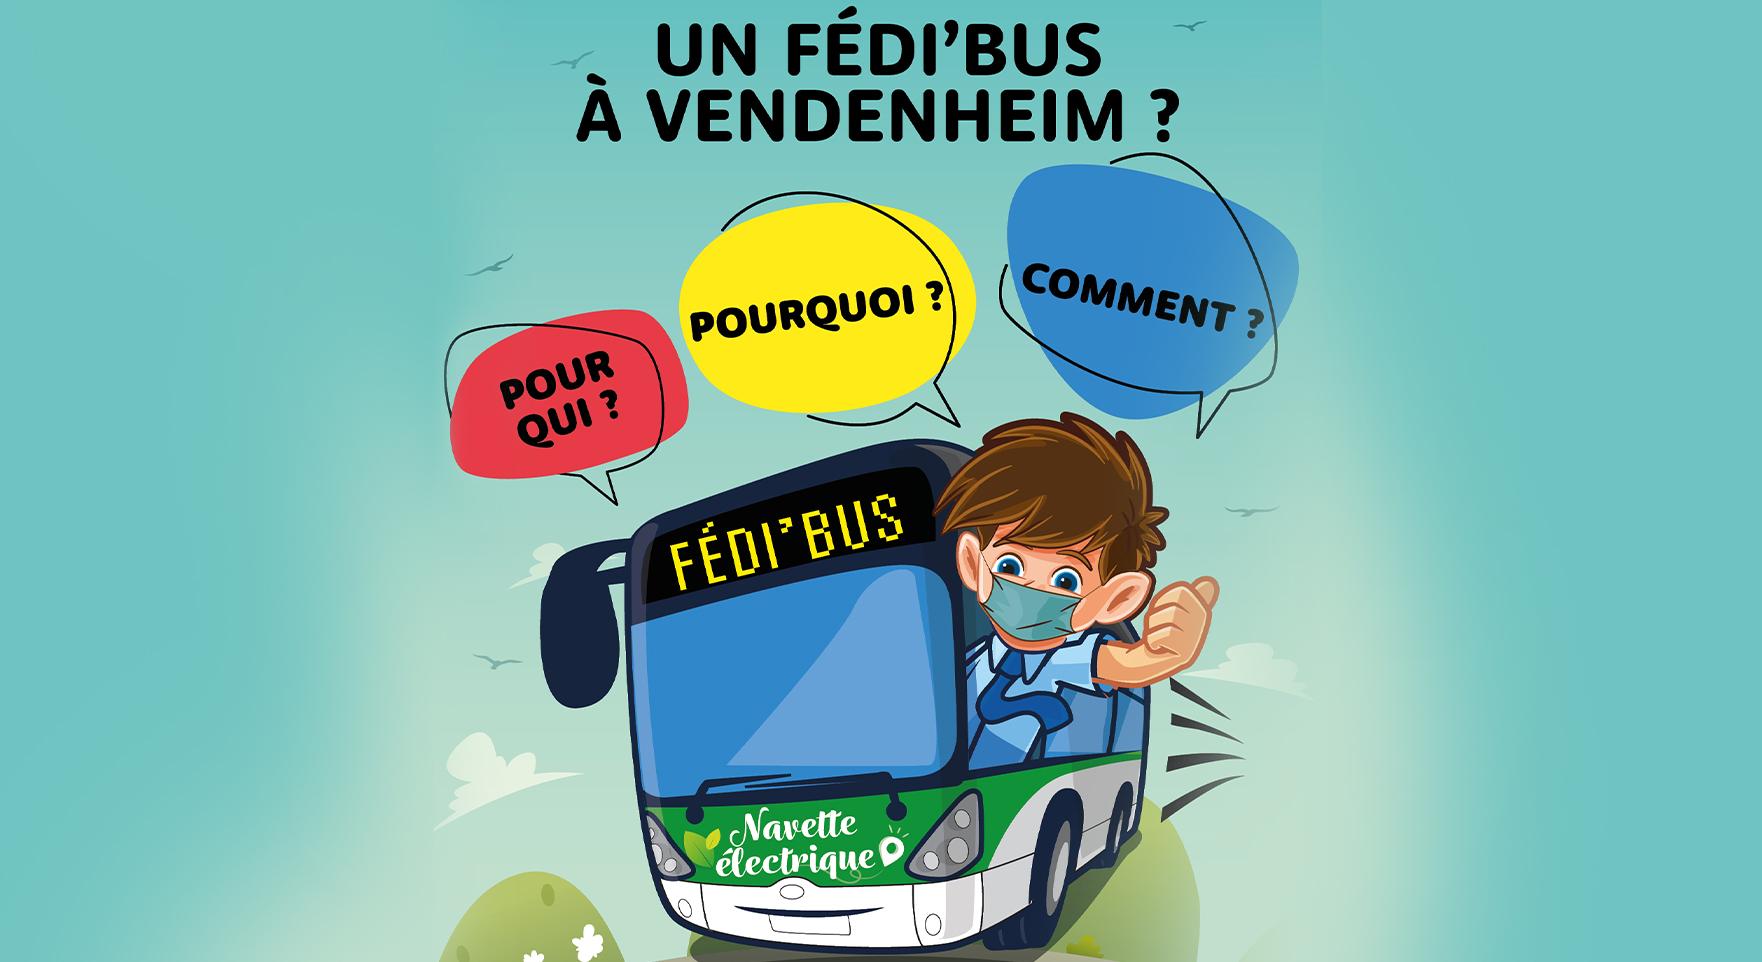 fedibus